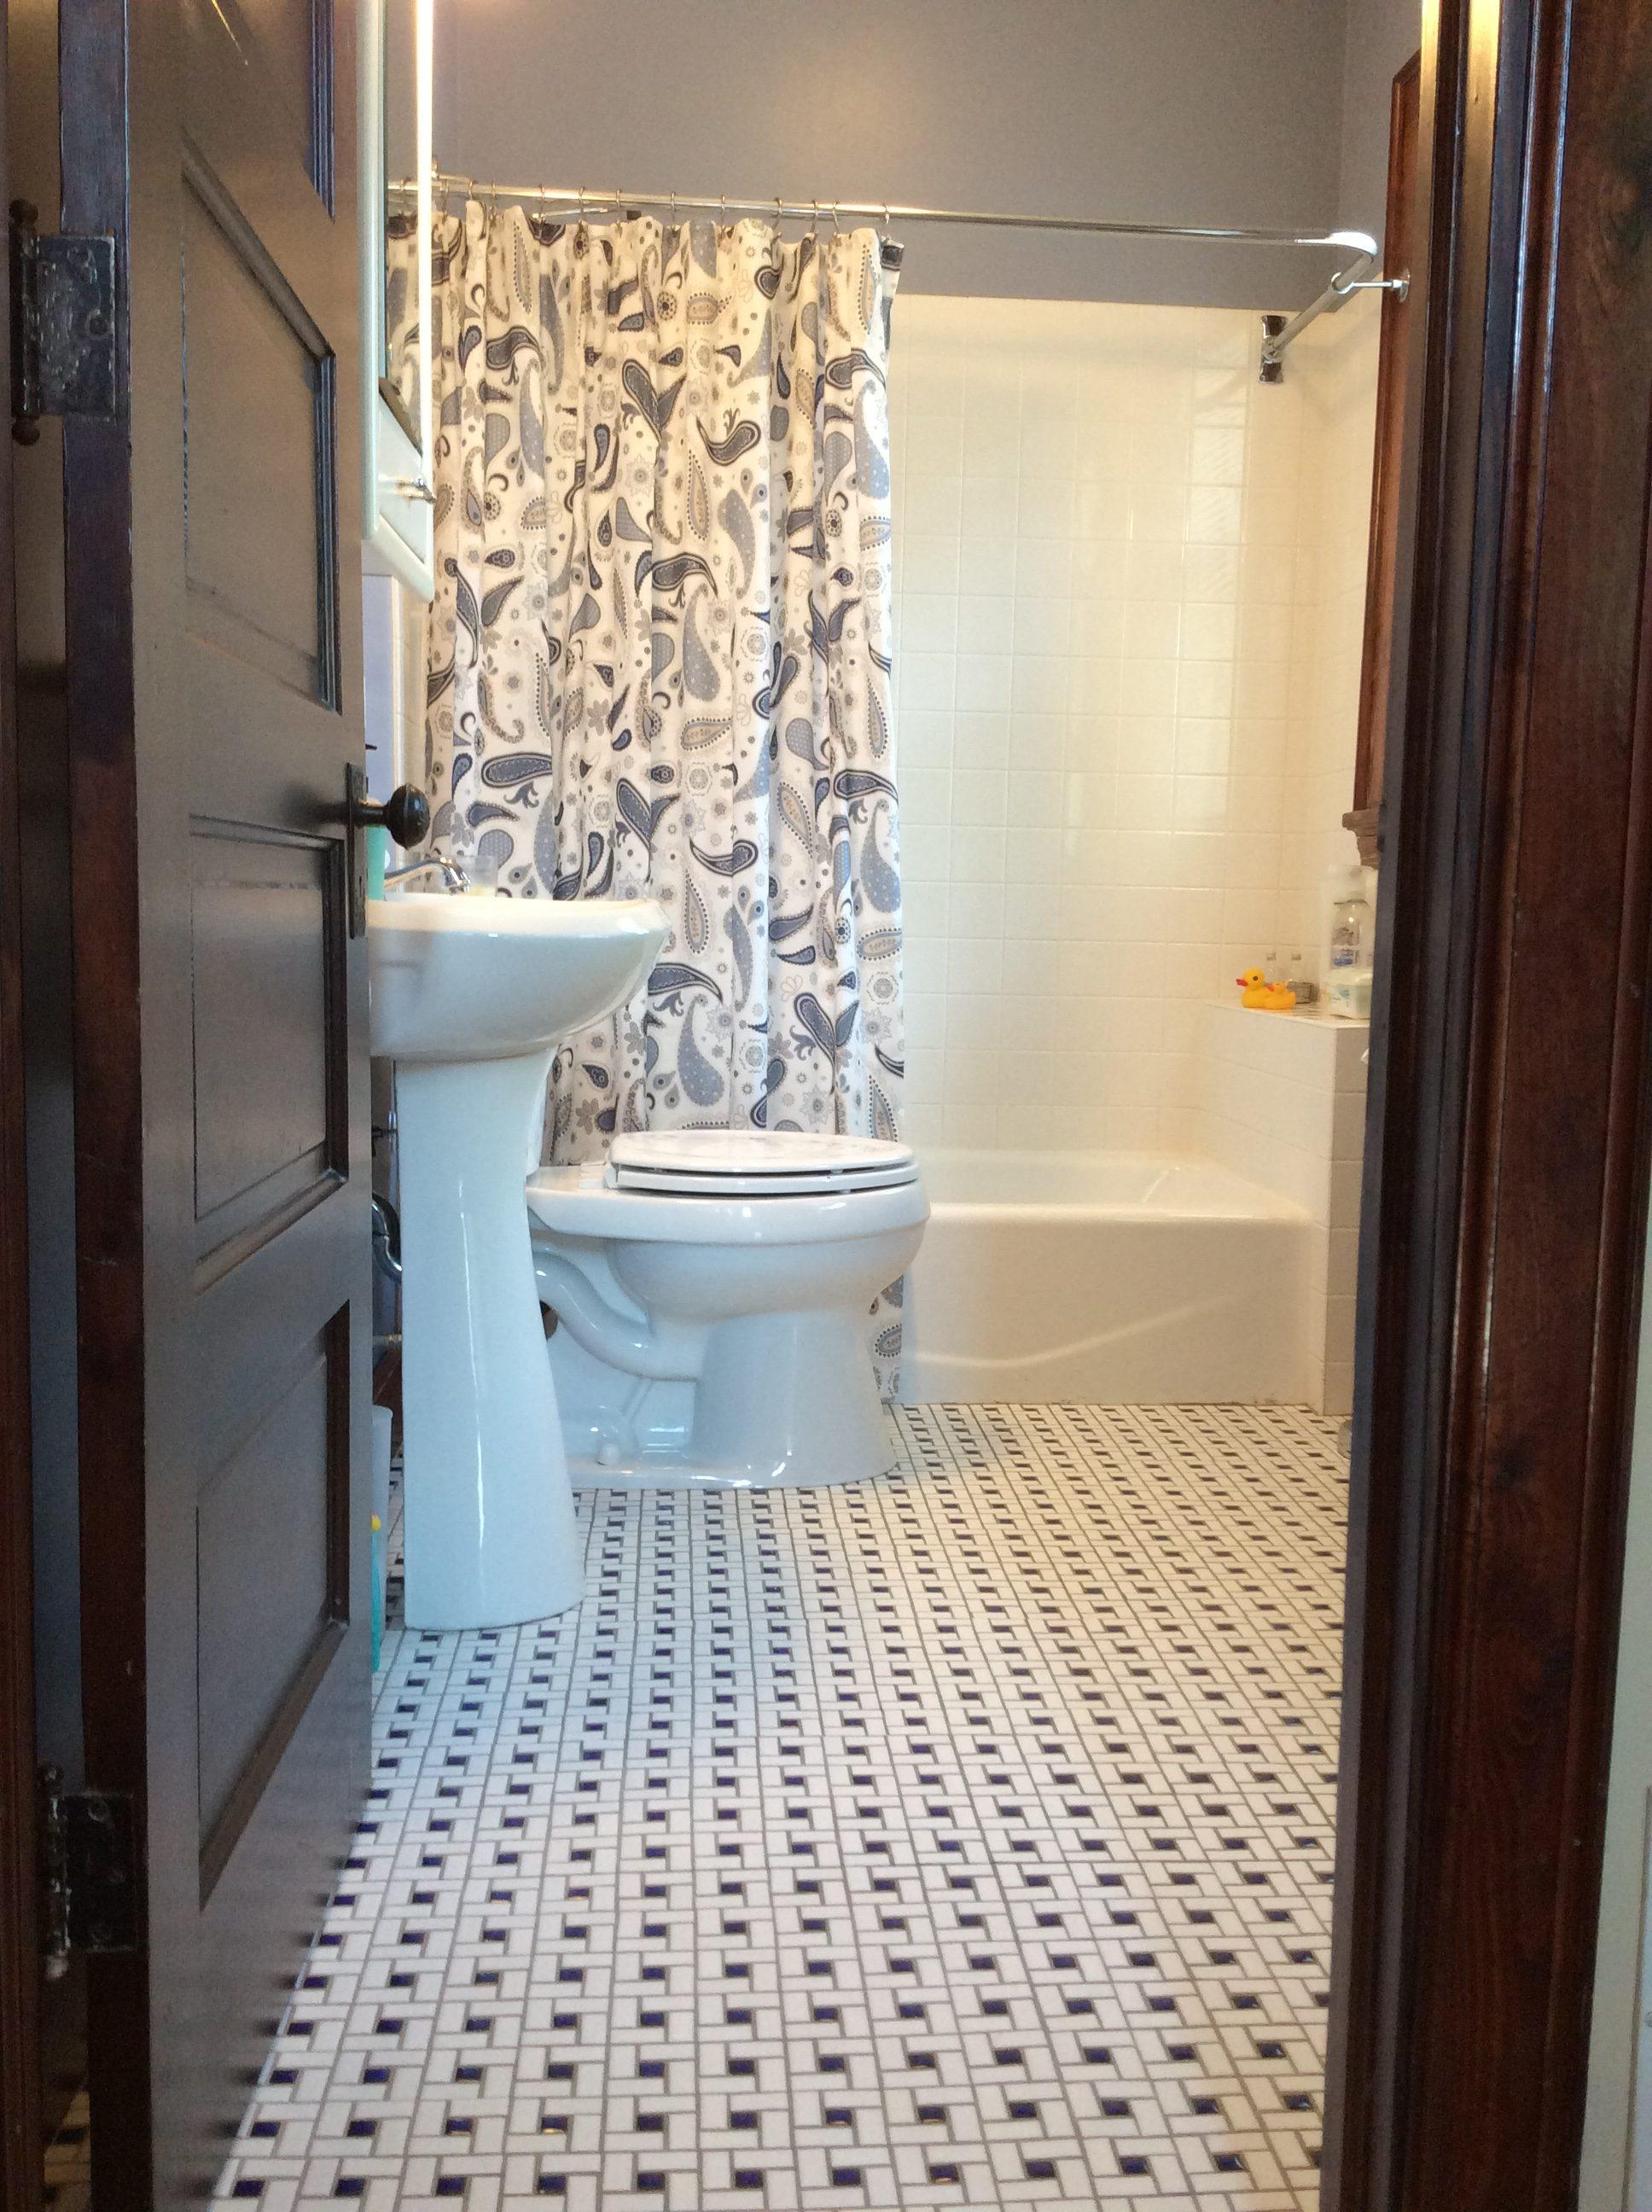 Fresh, clean tiled bathroom with rain shower head.